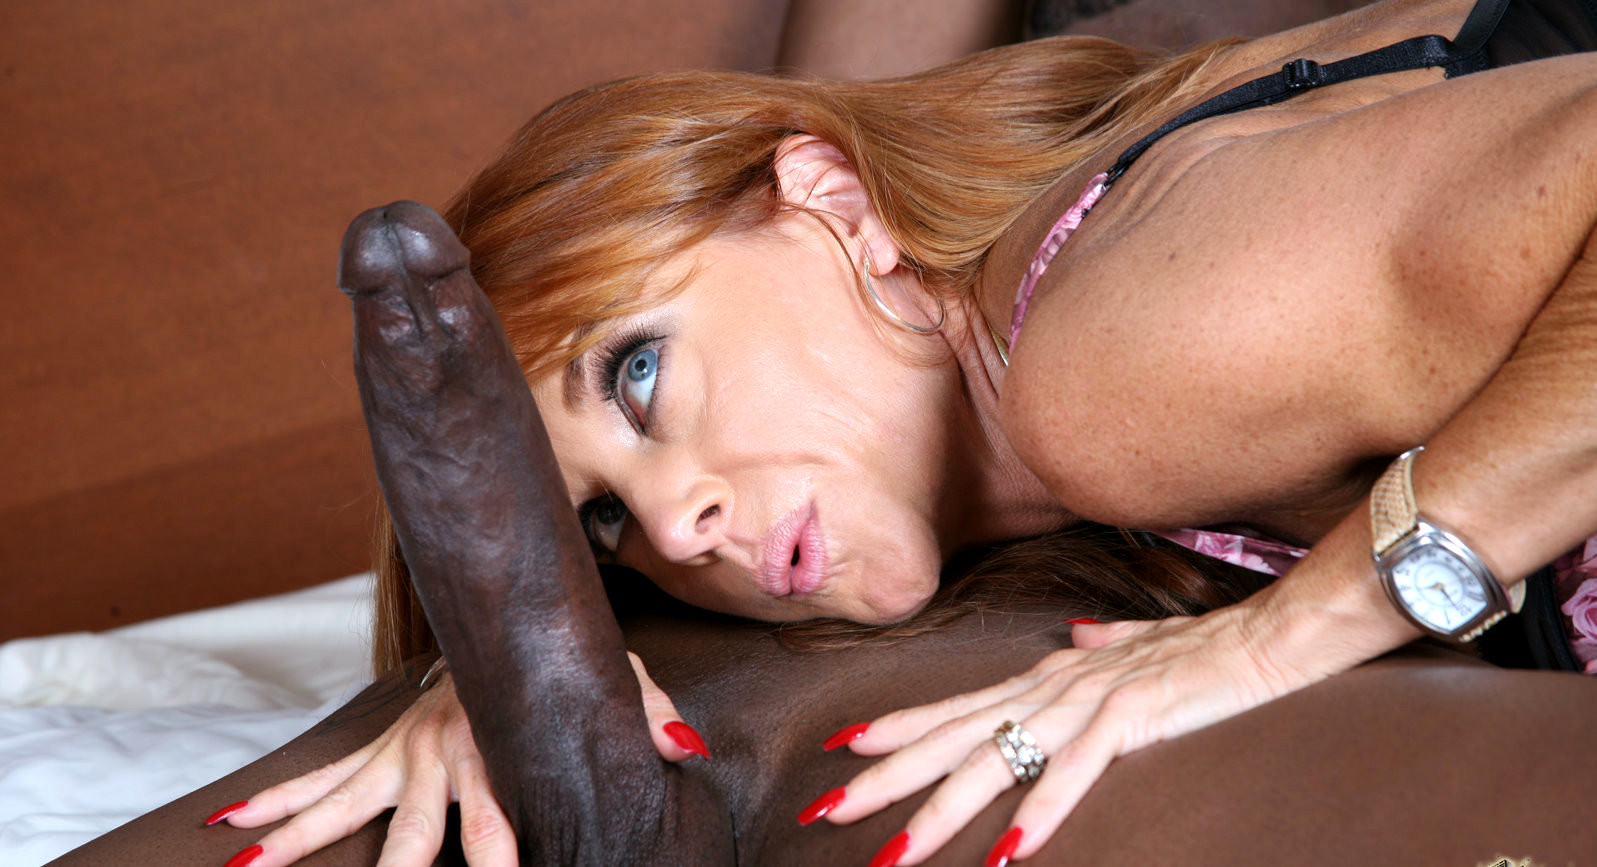 Janet mason enjoys shane diesel's company porn gif